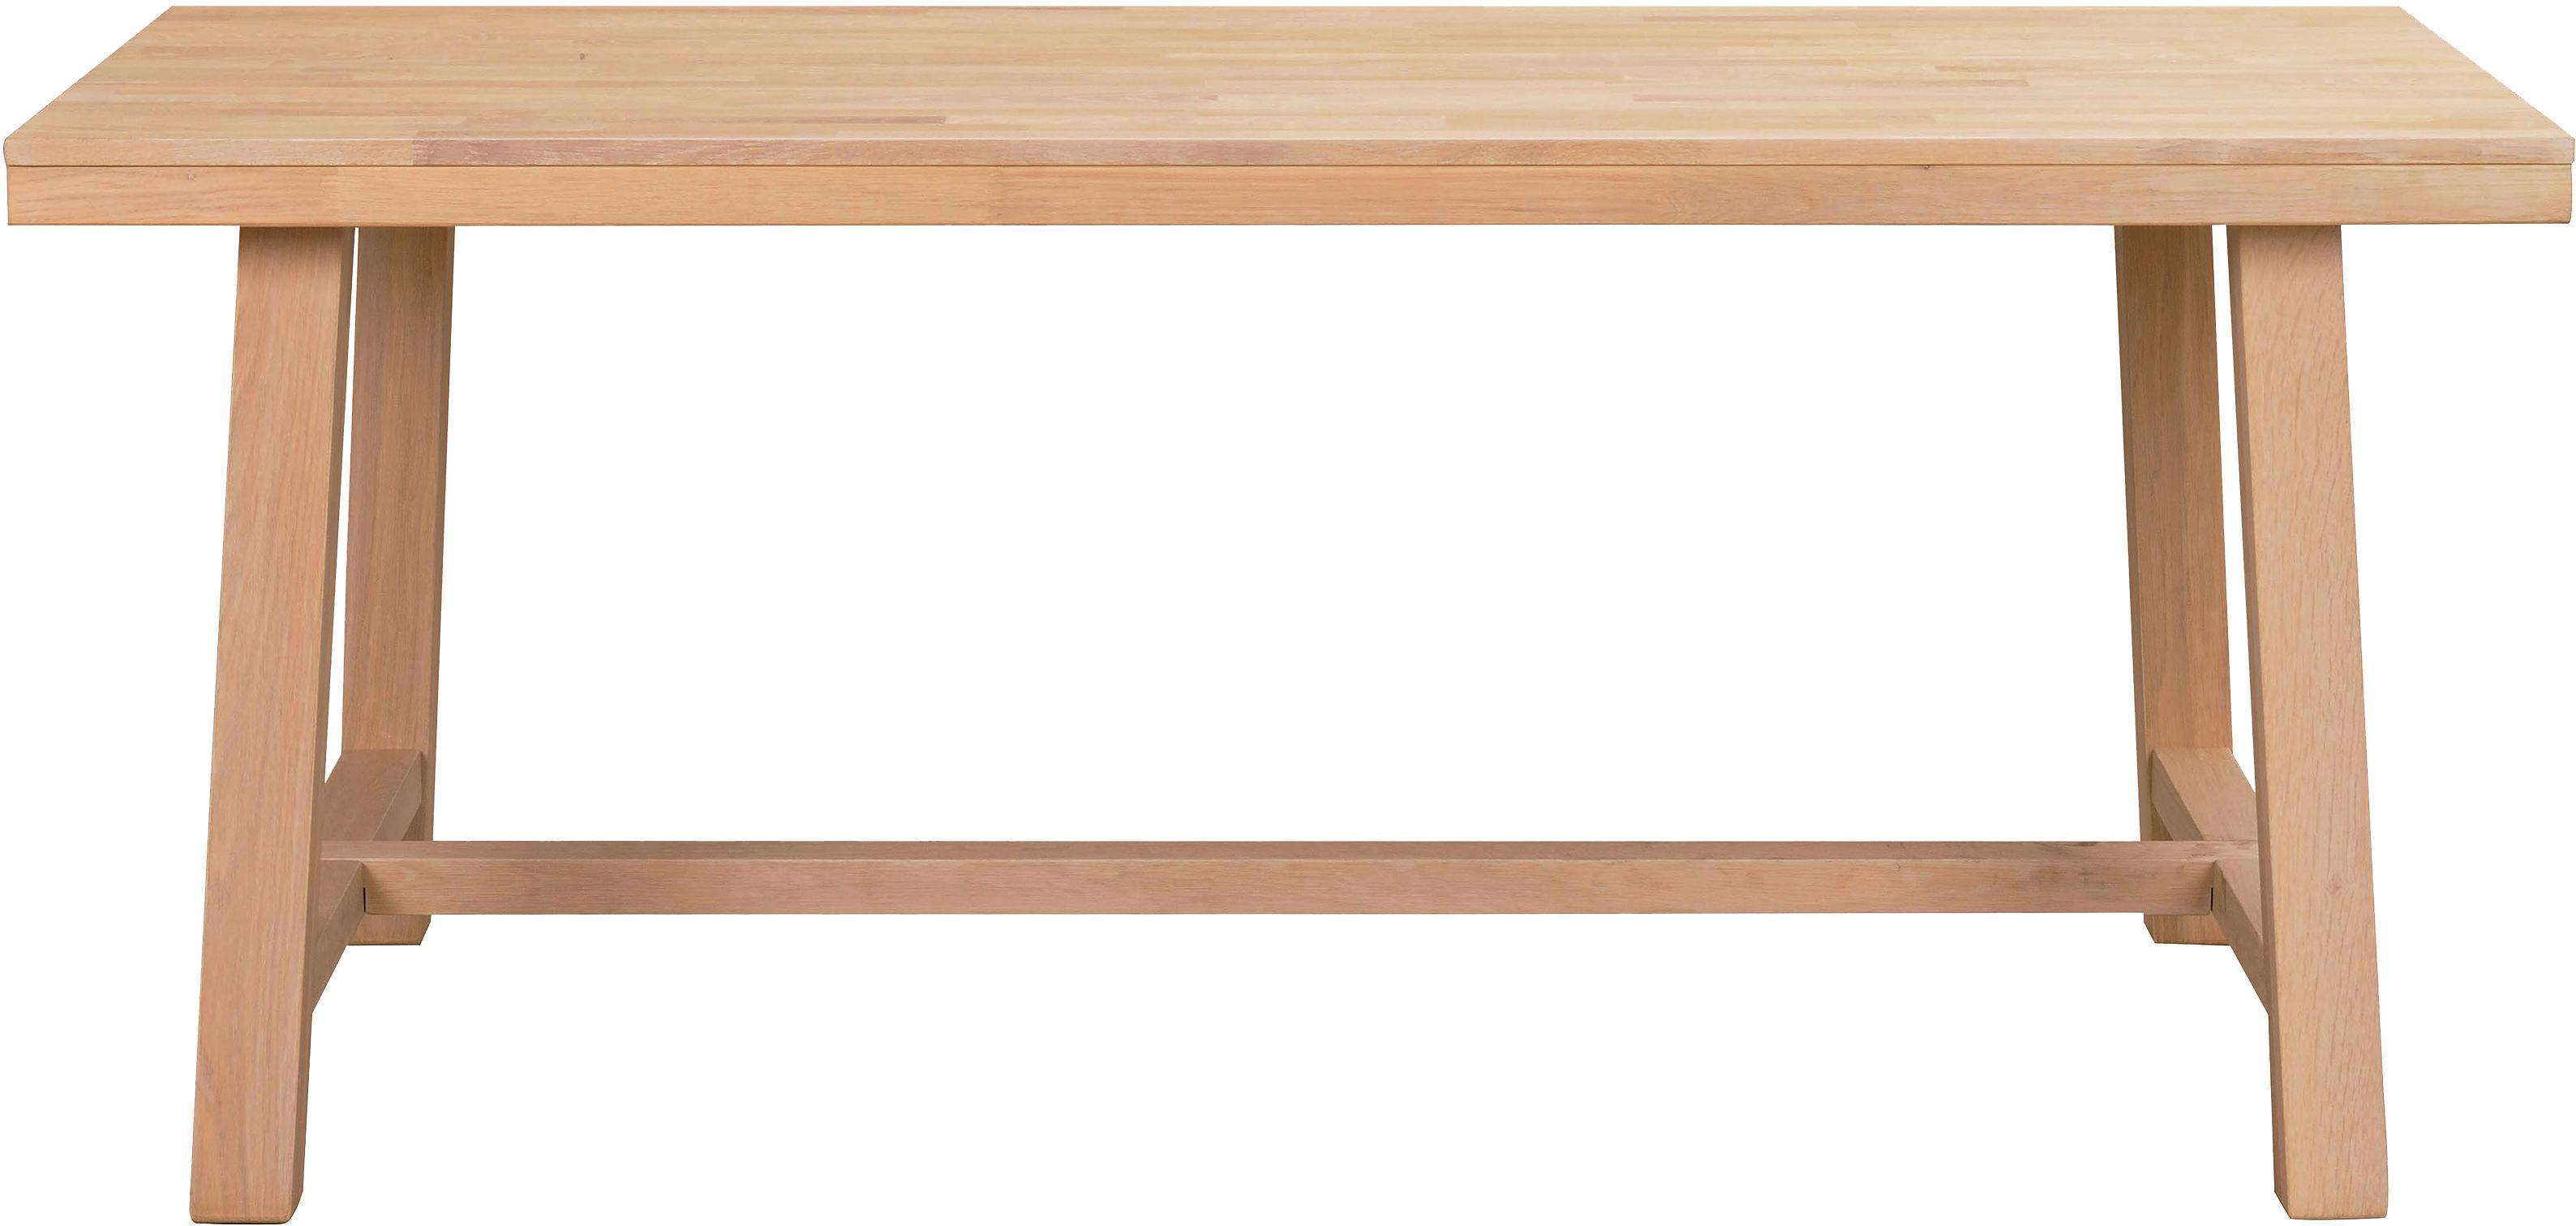 Verlengbare massief houten eettafel Brooklyn van eikenhout, Massief geborsteld en gelakt eikenhout, Eikenhoutkleurig, B 170-220 x D 95 cm